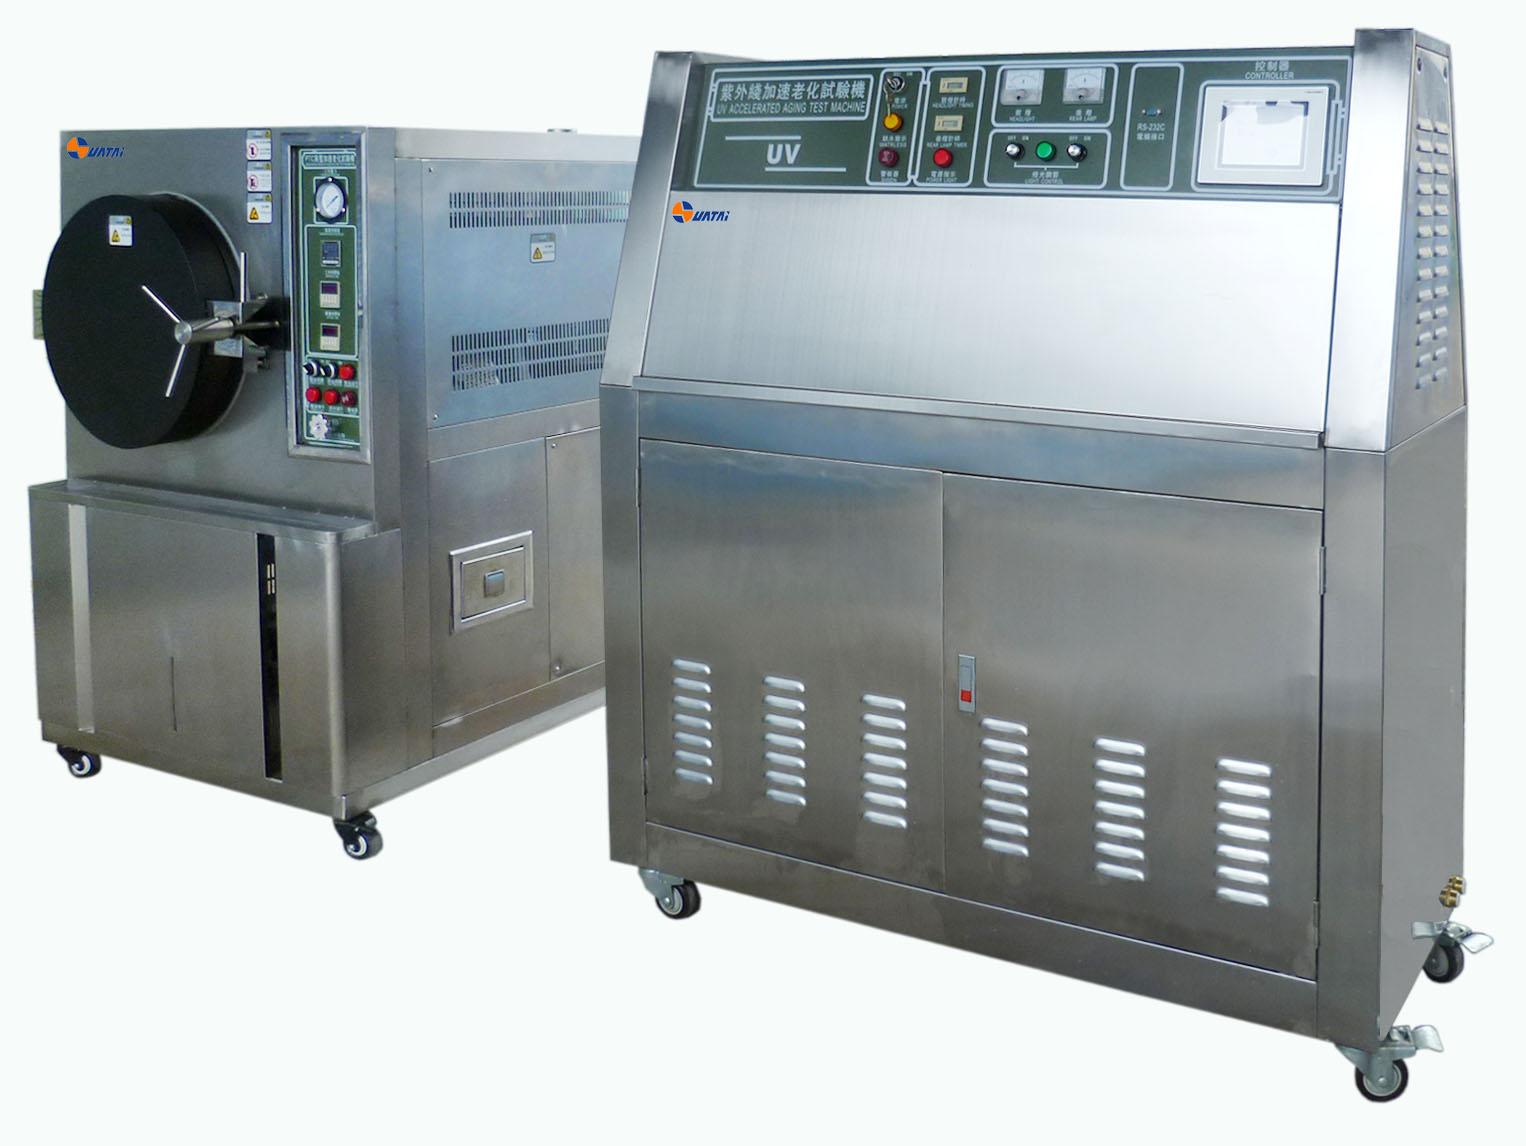 UV紫外线老化箱是一种常用的实验箱类型,适用于非金属材料的耐阳光和人工光源的老化实验。紫外线加速老化箱在使用过程中会受到一些环境影响,那么紫外光老化箱的环境影响因素有哪些呢? 1、箱内温度 照射阶段或停照阶段,箱内温度应规定的试验程序(A、B或C)加以控制,有关规范应按设备或元件的预定用途规定在照射阶段需达到的温度+40度或+55度。 2、气流速度 靠近样品表面的气流速度大小除影响样品的升温外,甚至还使监控辐射强度的开启式温差电堆出现显著误差。一般1m/s的速度导致温差电堆的温升量减少20%以上。可见在有